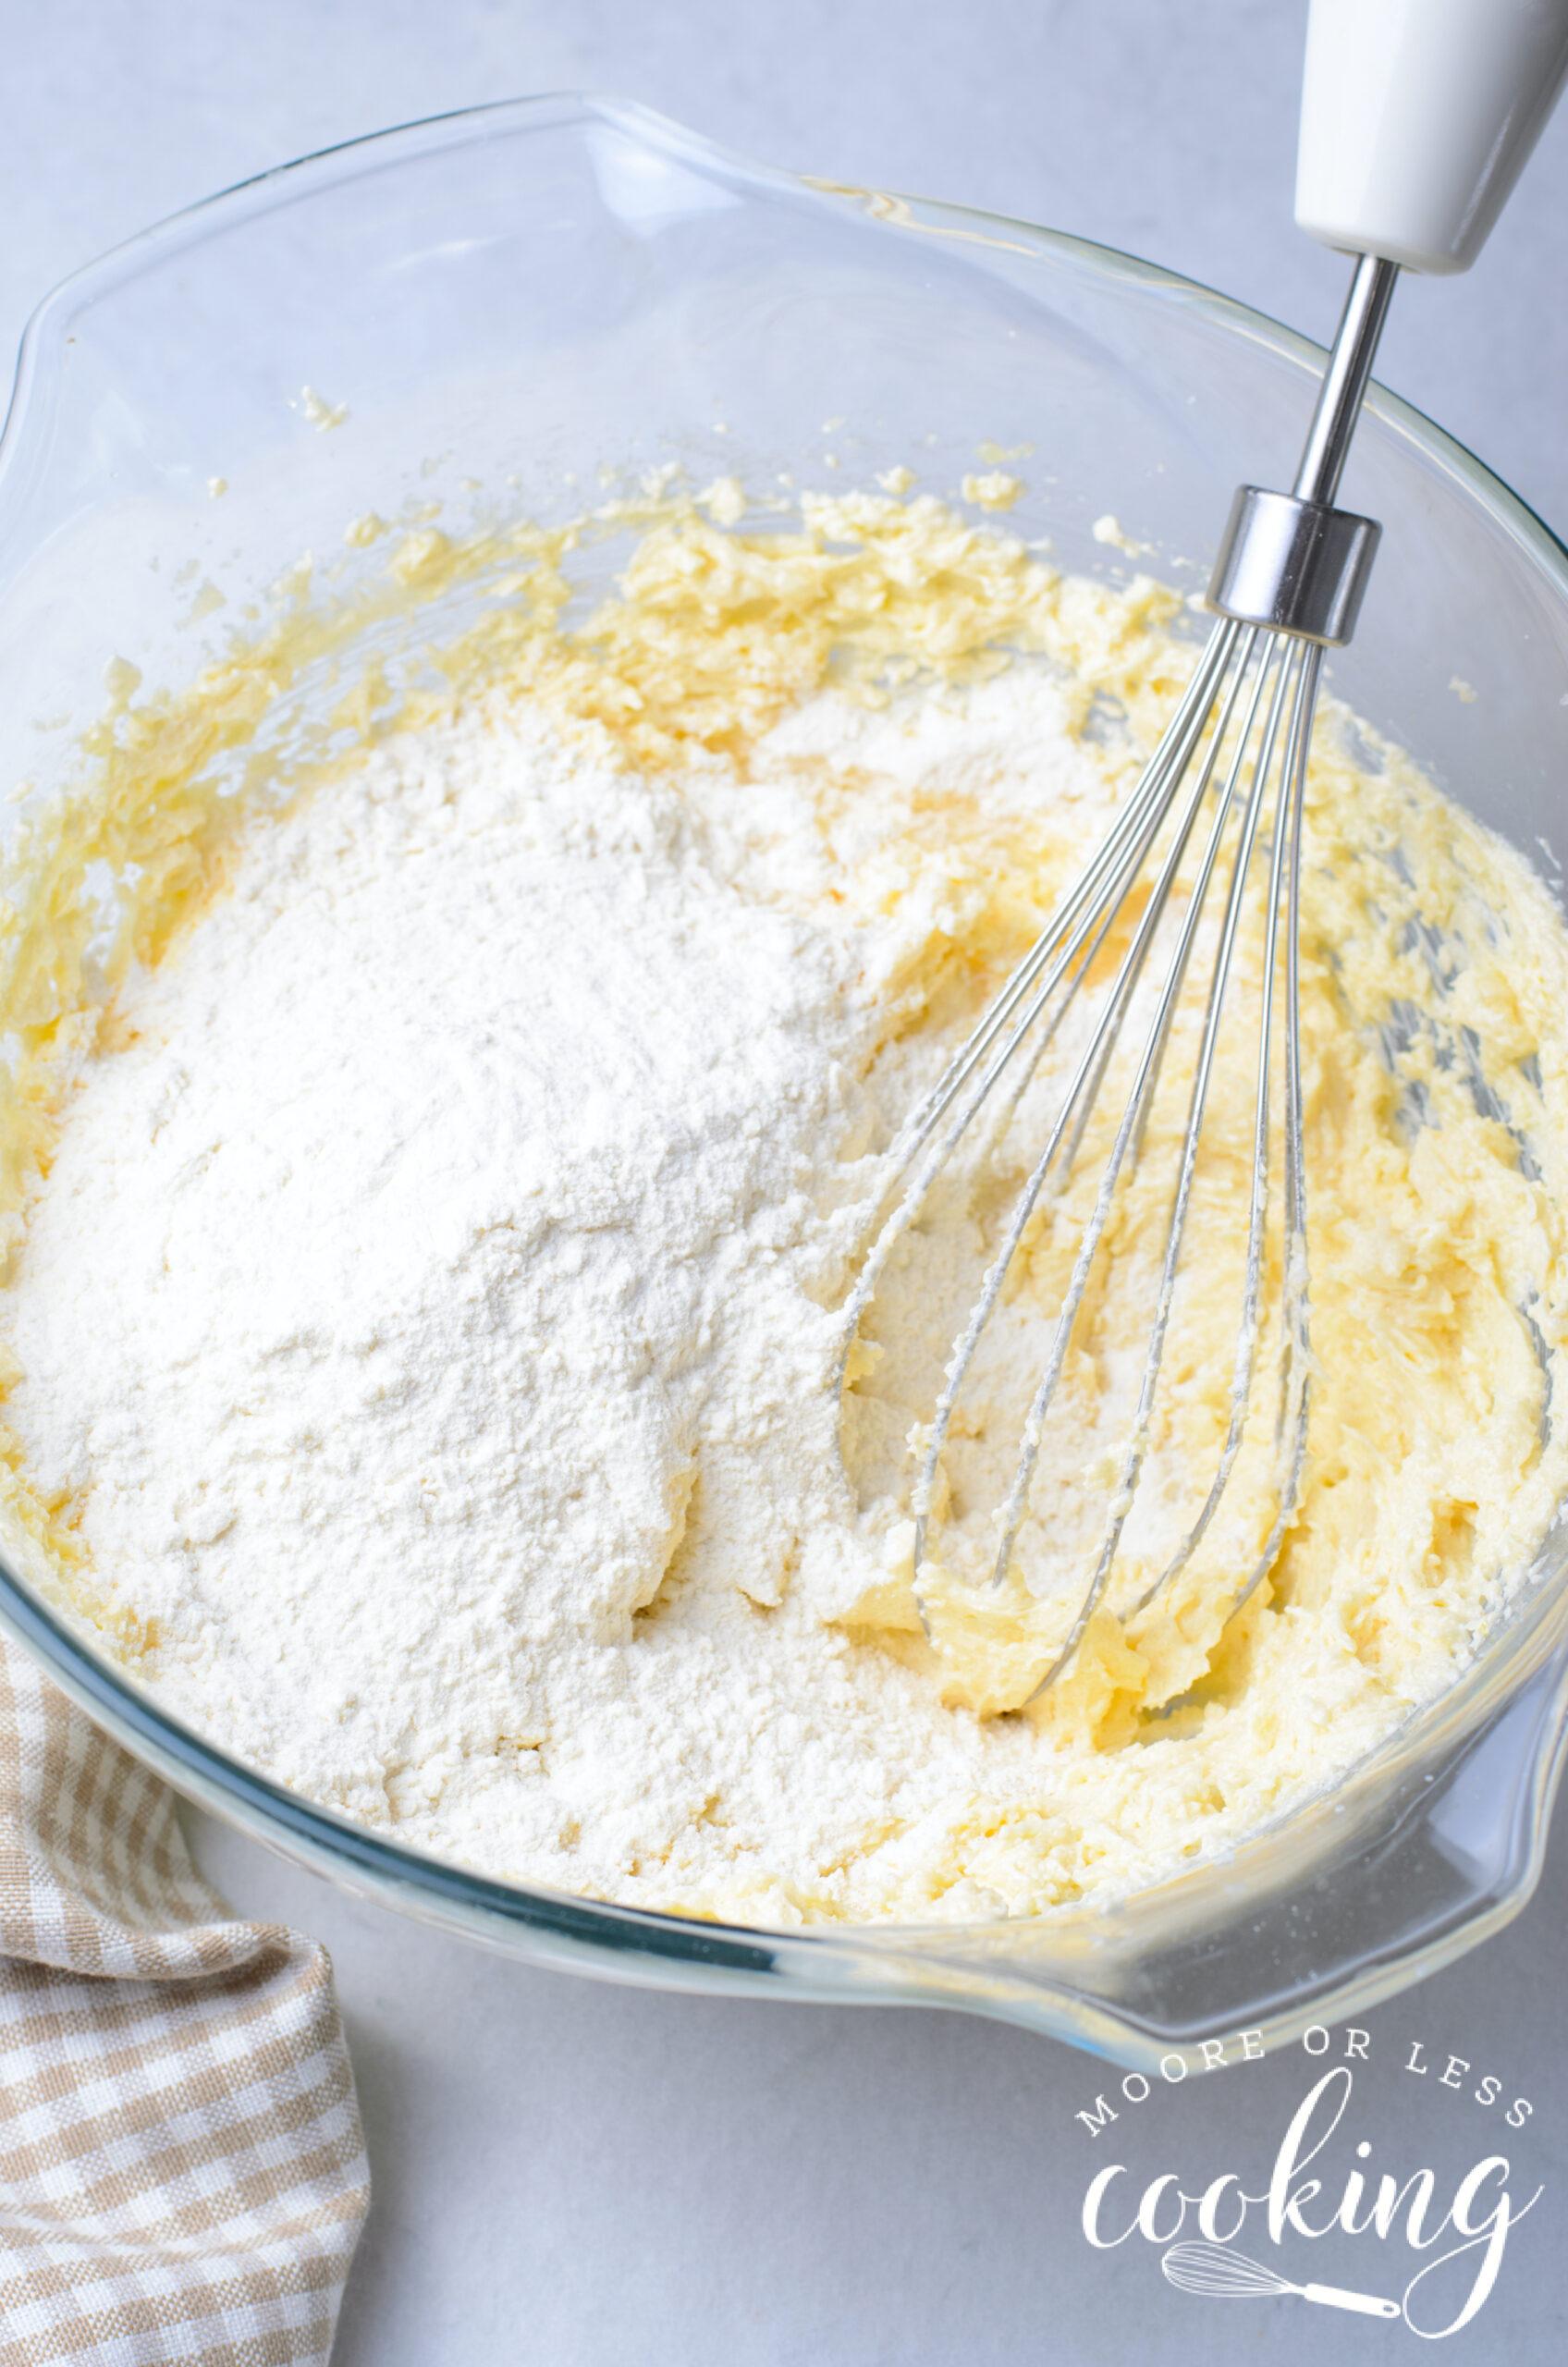 mixing ingredients